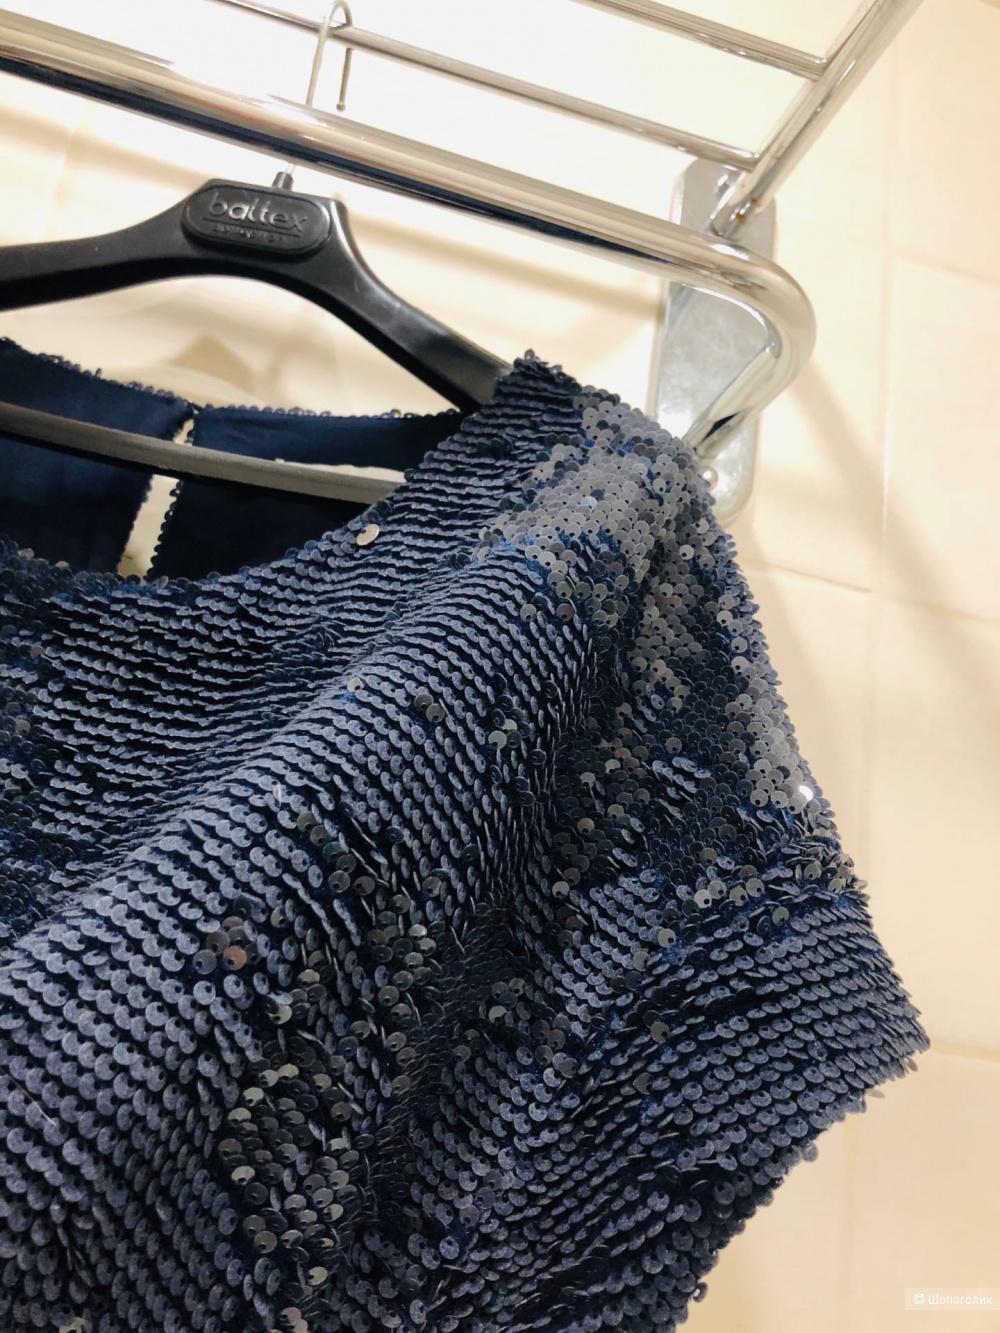 Блузка HAMPTON BAYS. Размер M-L.